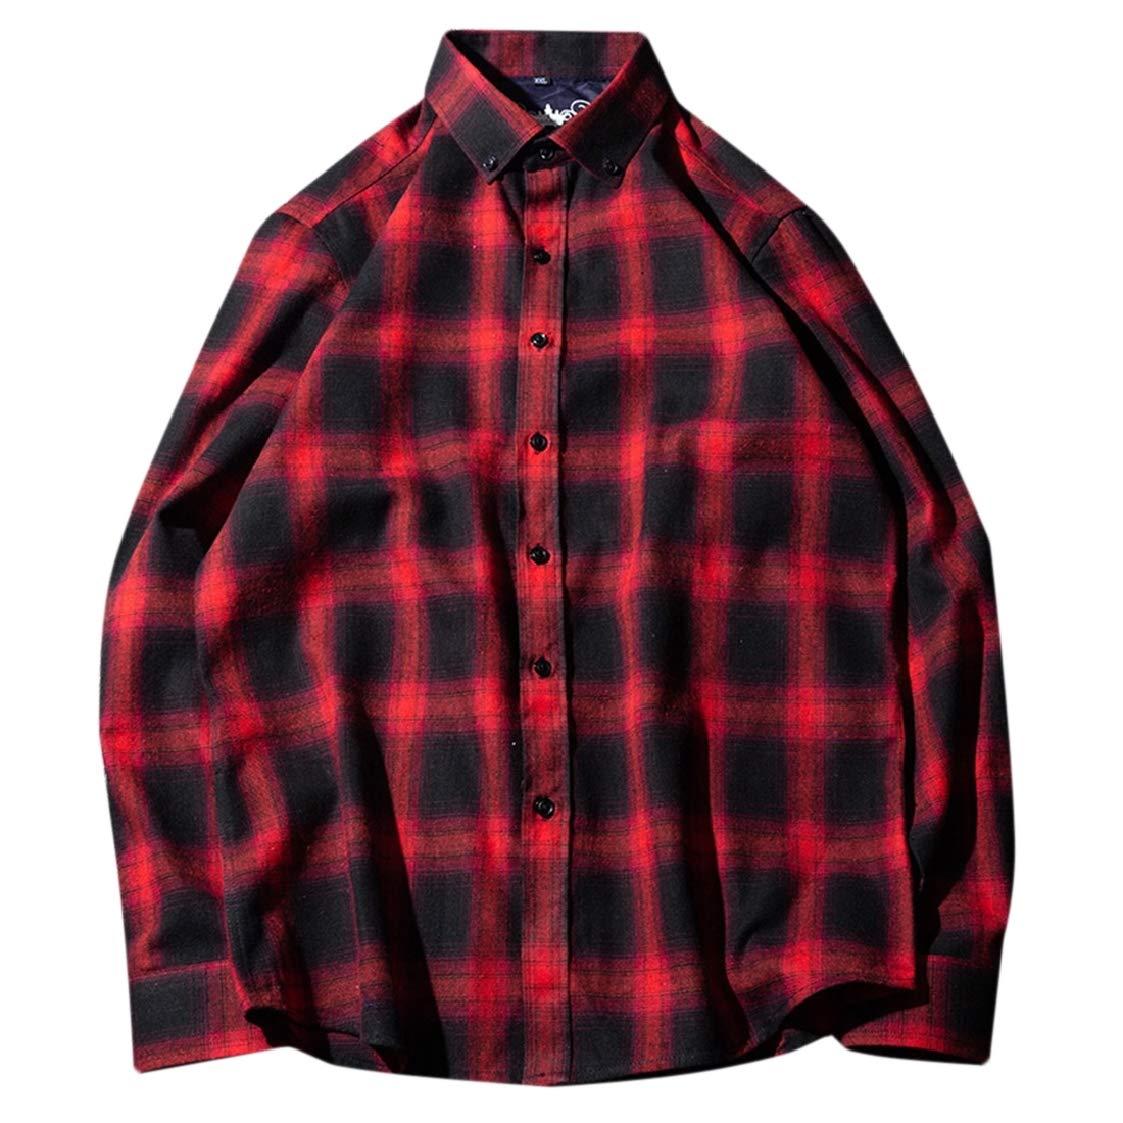 Nanquan Men Big /& Tall Casual Plaid Button Up Regular-Fit Long Sleeve Shirts